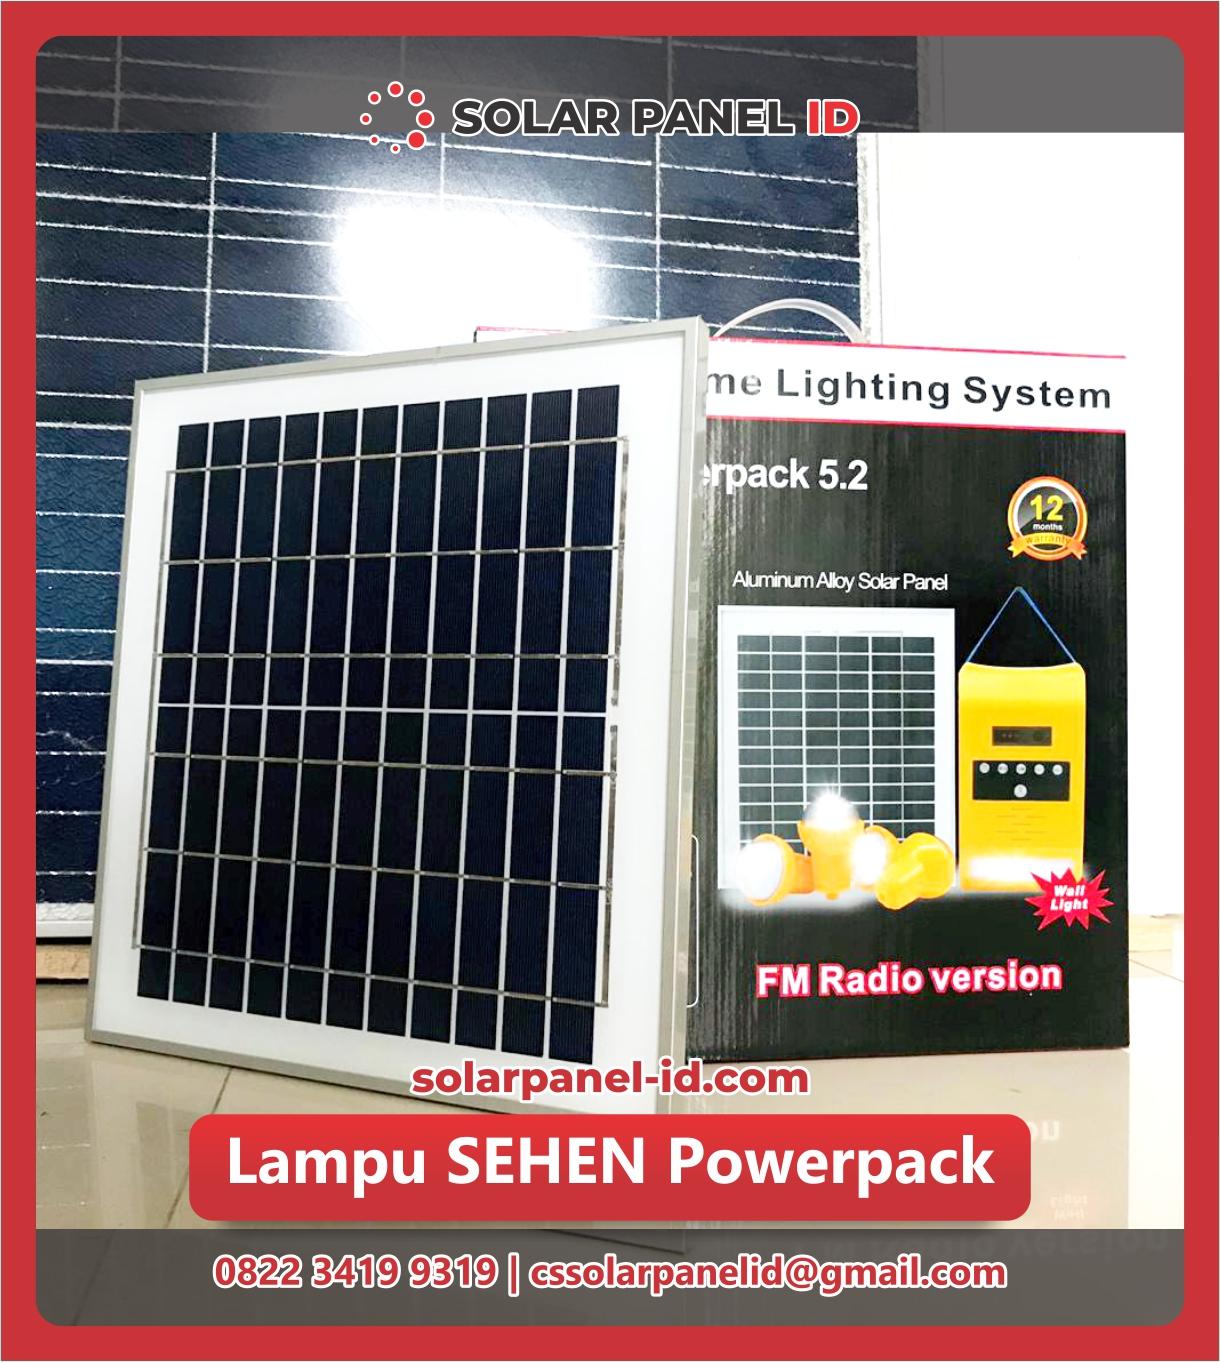 Jual paket SEHEN solarkit powerpack Tenaga Surya murah lengkap